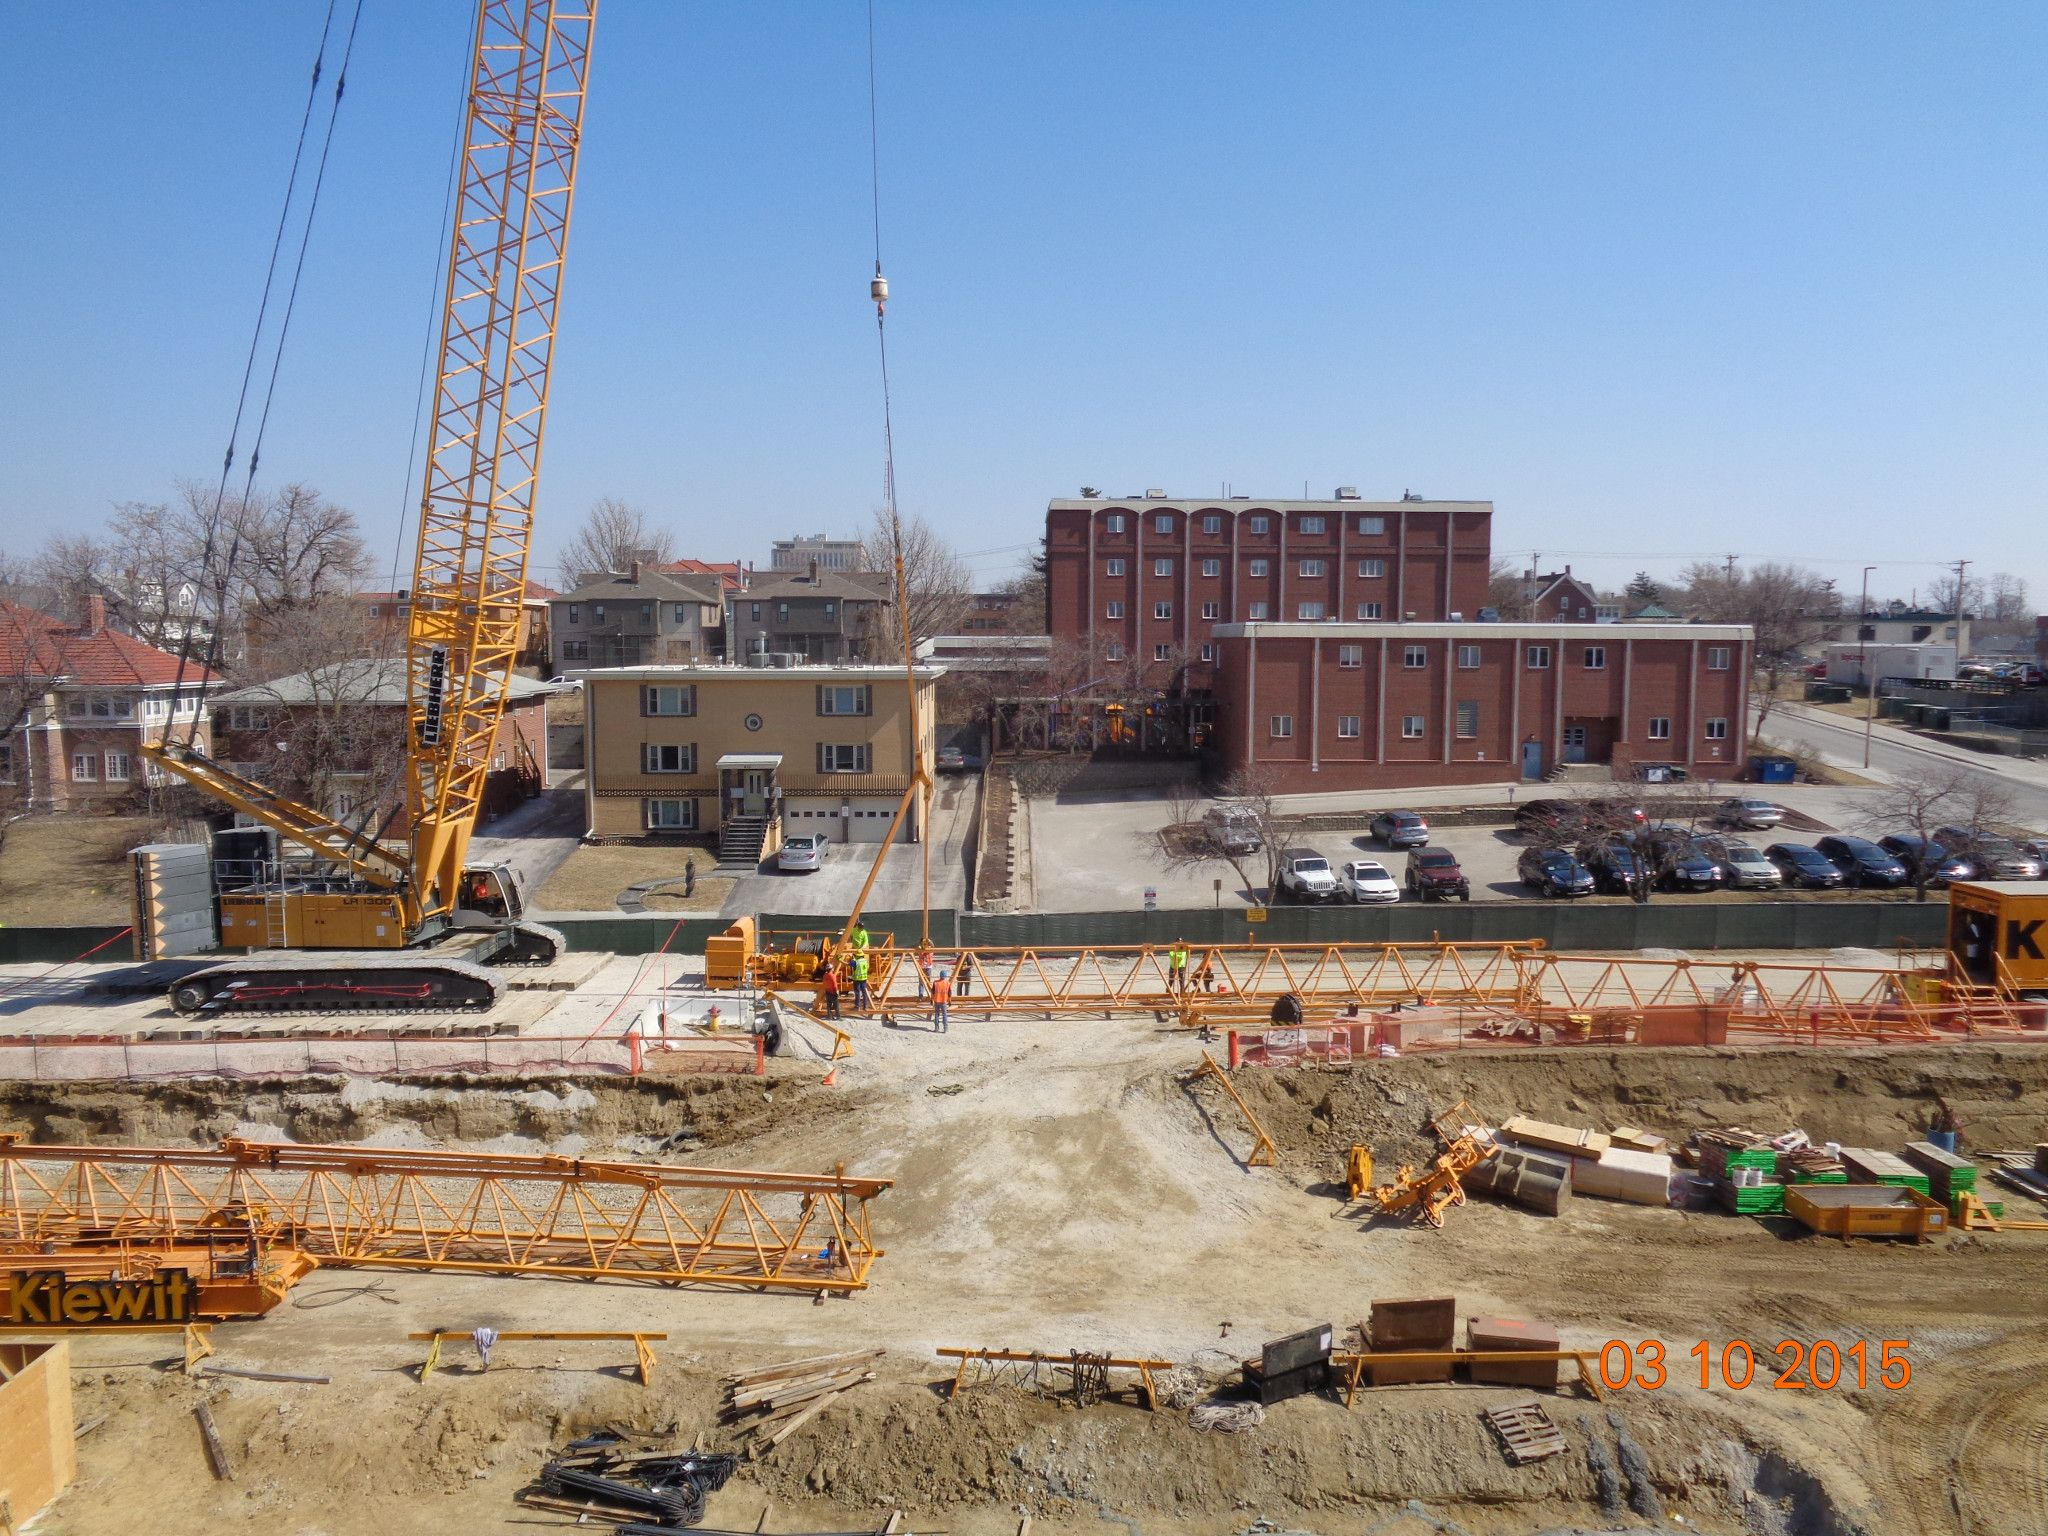 Nebraska Medicine Lot 6 Parking Structure